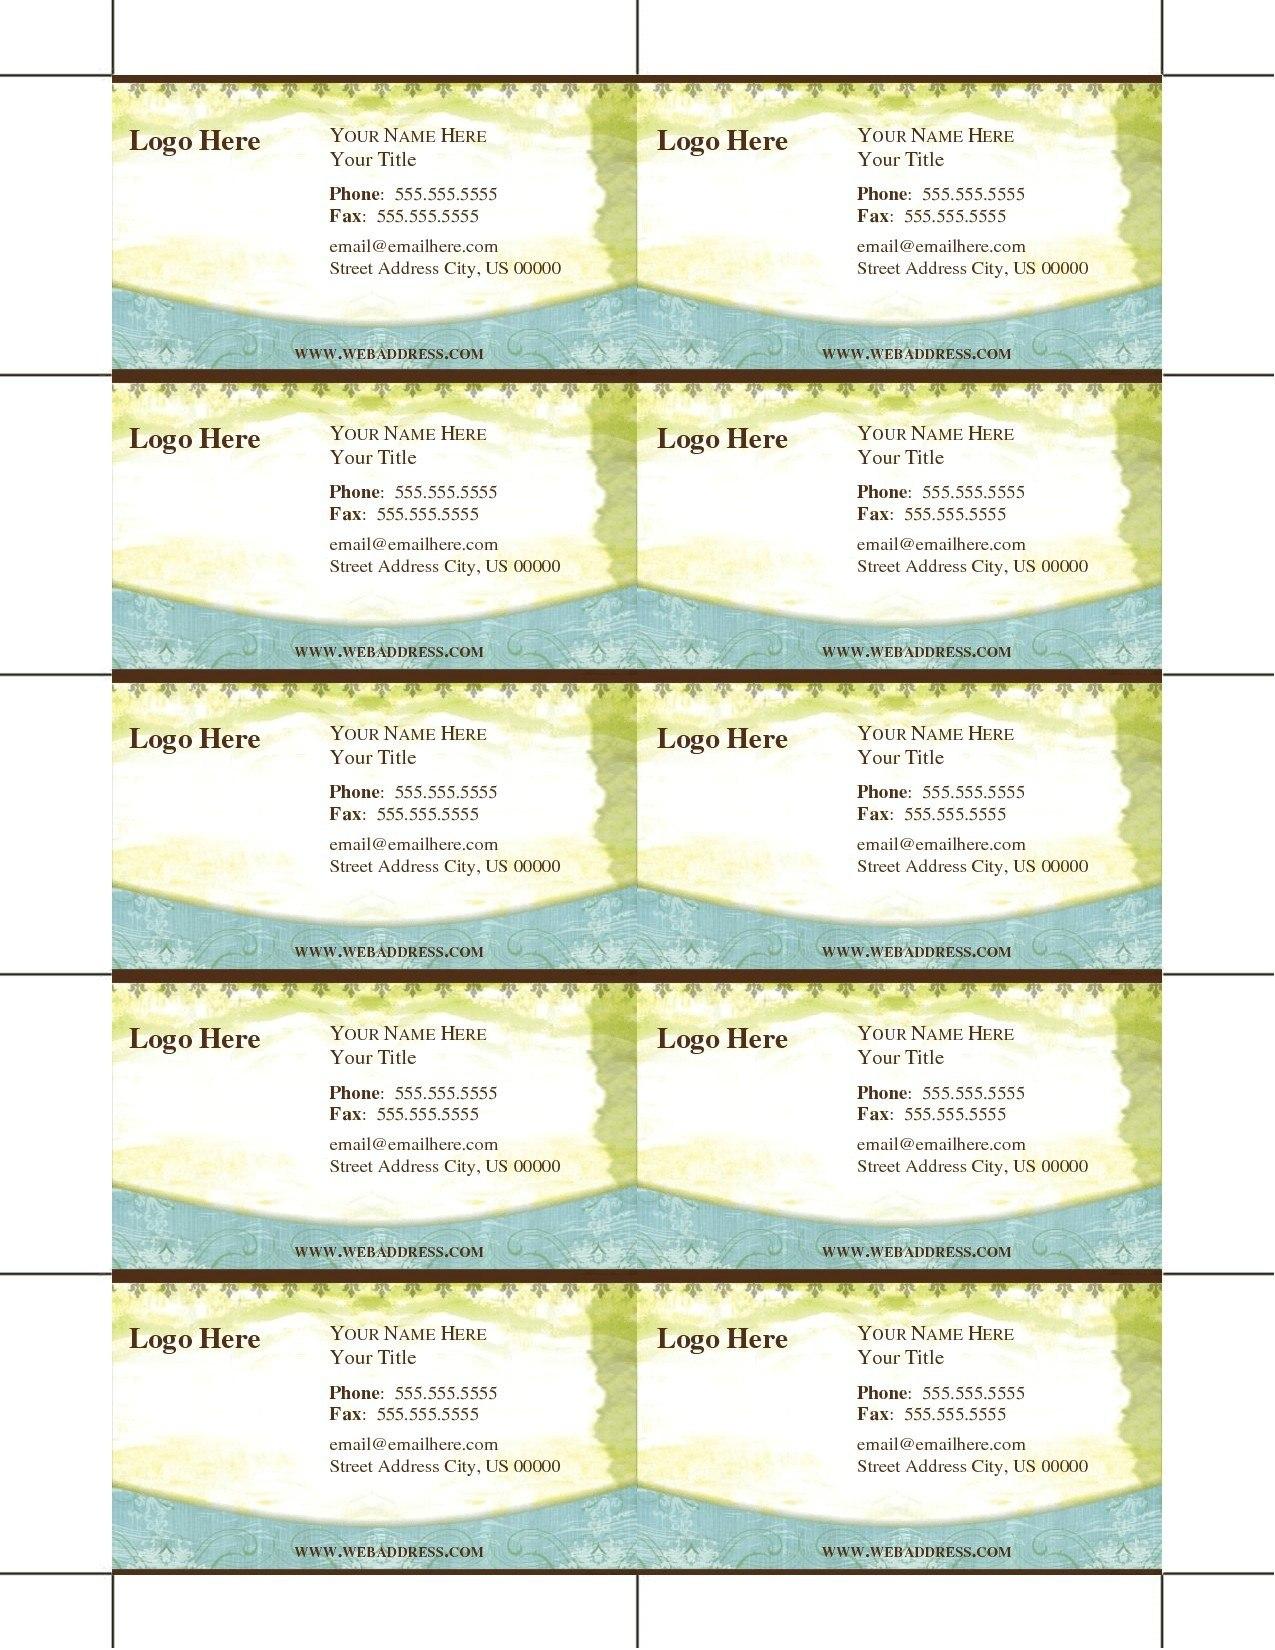 Luxury Blank Business Card Template Microsoft Word  Wwwpantry In Ms Word Business Card Template